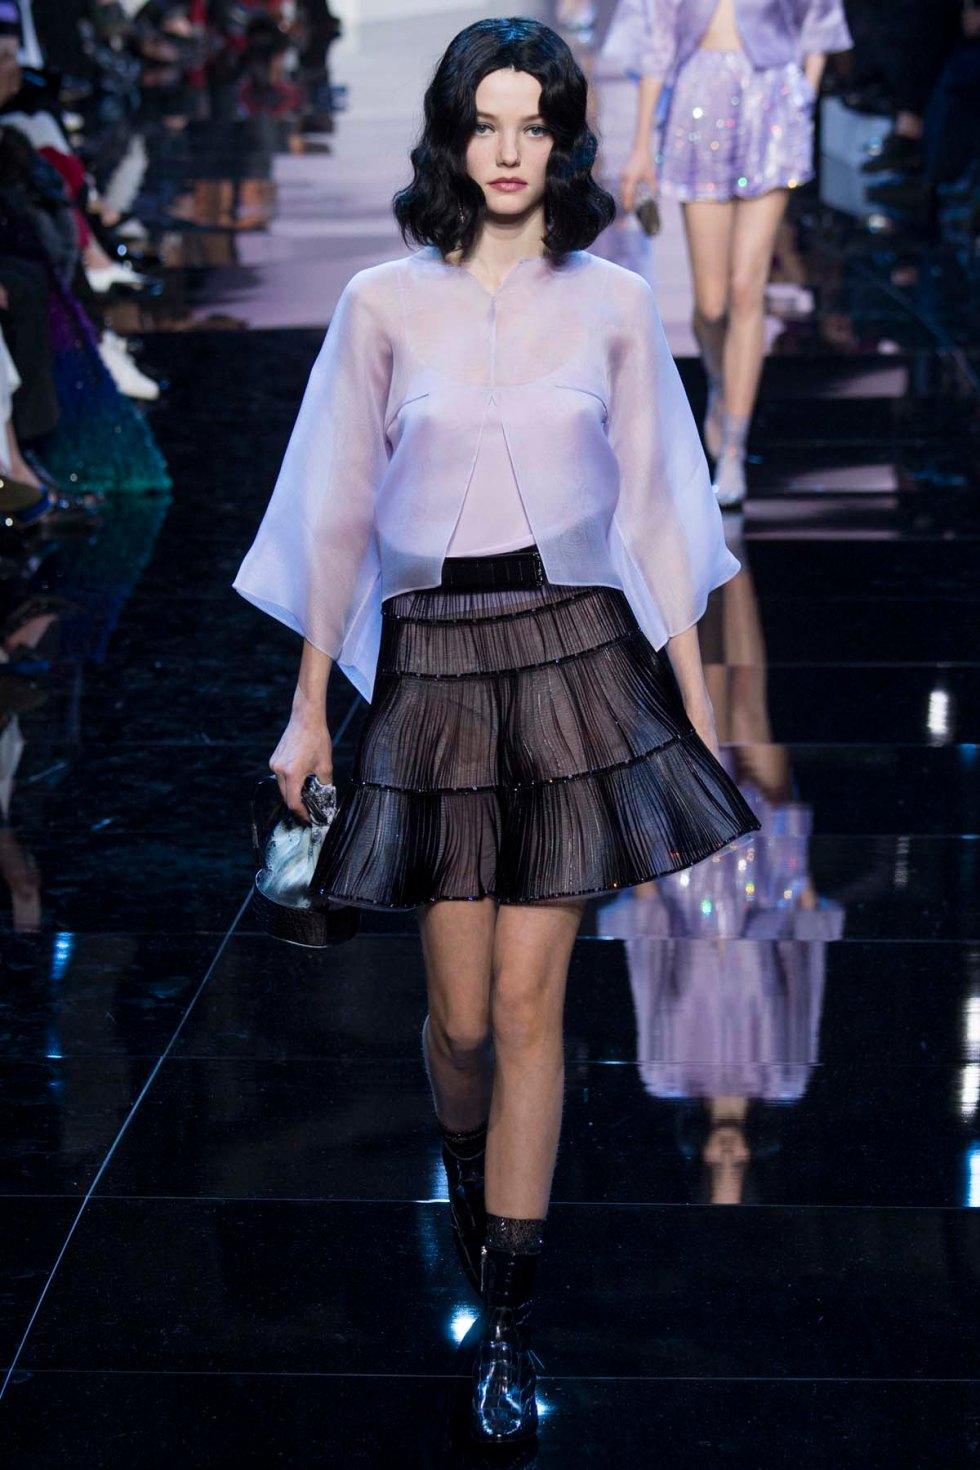 Armani-Privé-Couture-ss16-pfw-10